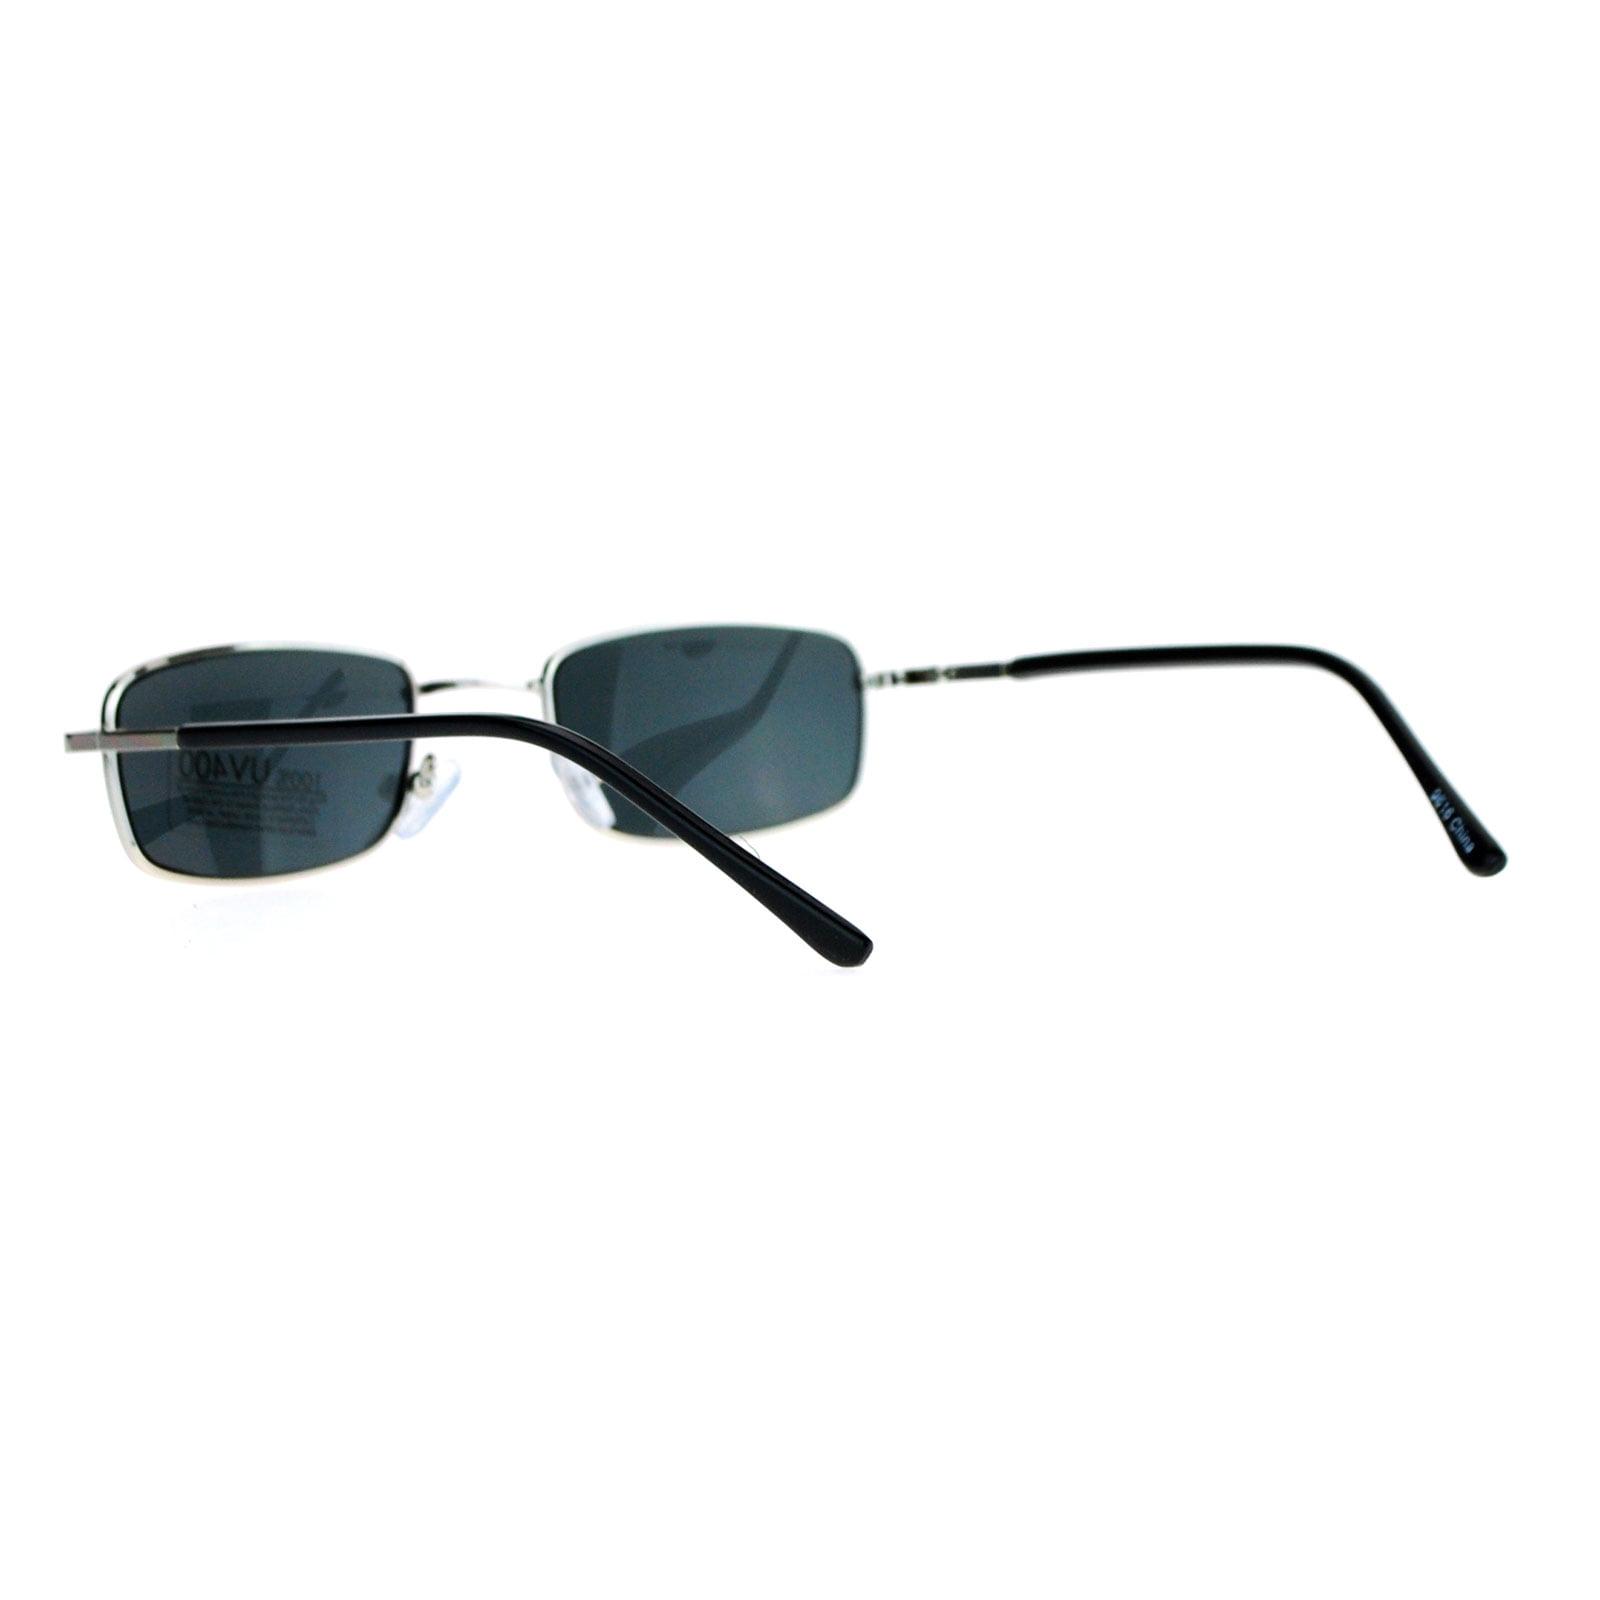 c0c854ca0fa SA106 - SA106 Spring Hinge Mens Snug Narrow Rectangular Metal Rim Sunglasses  Gold - Walmart.com